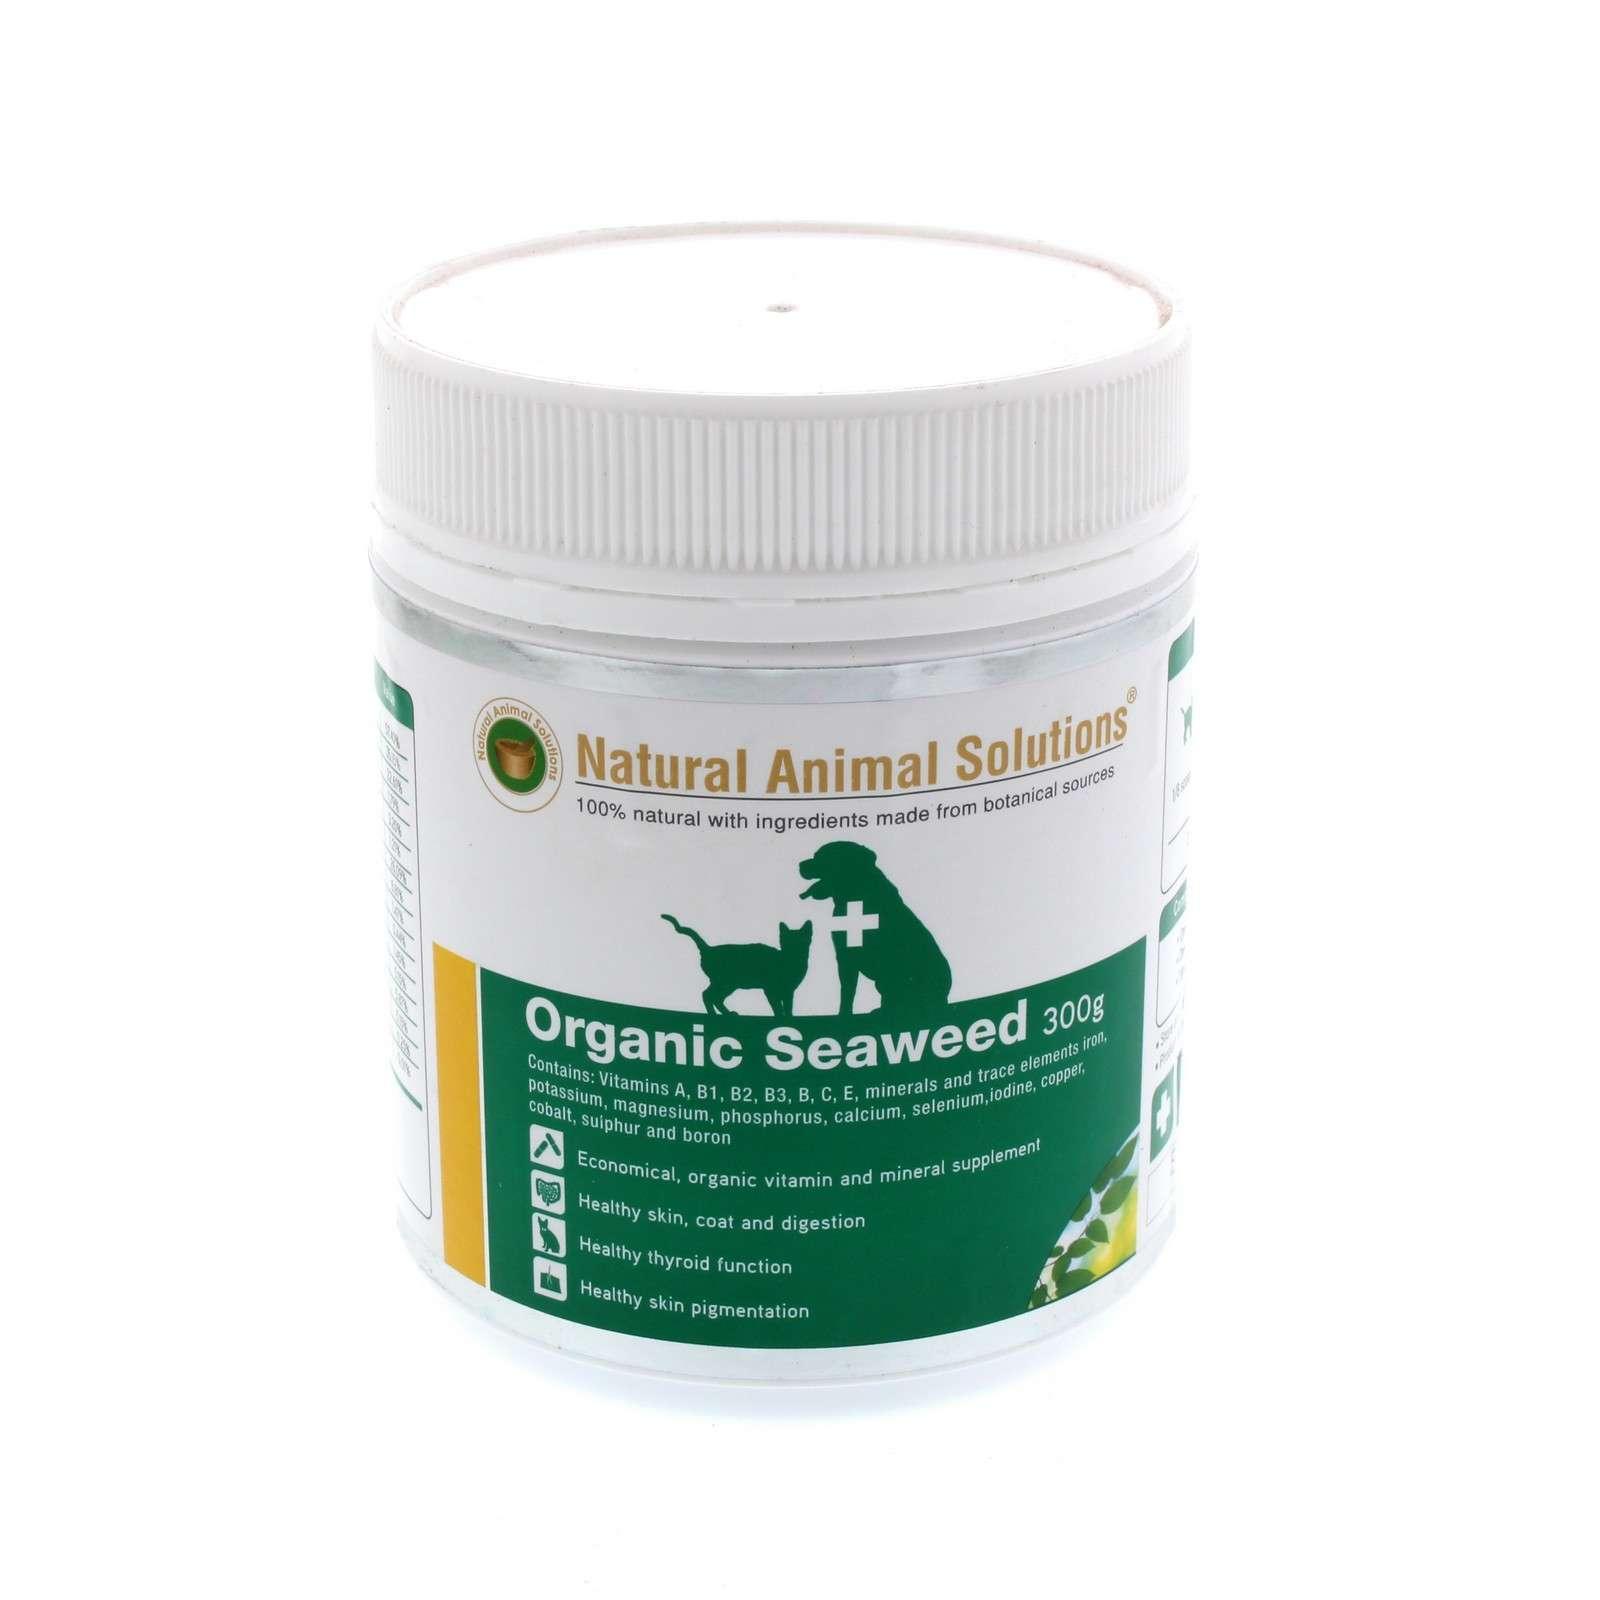 Dog Cat Essential Vitamins Organic Seaweed 300g Natural Animal Solutions